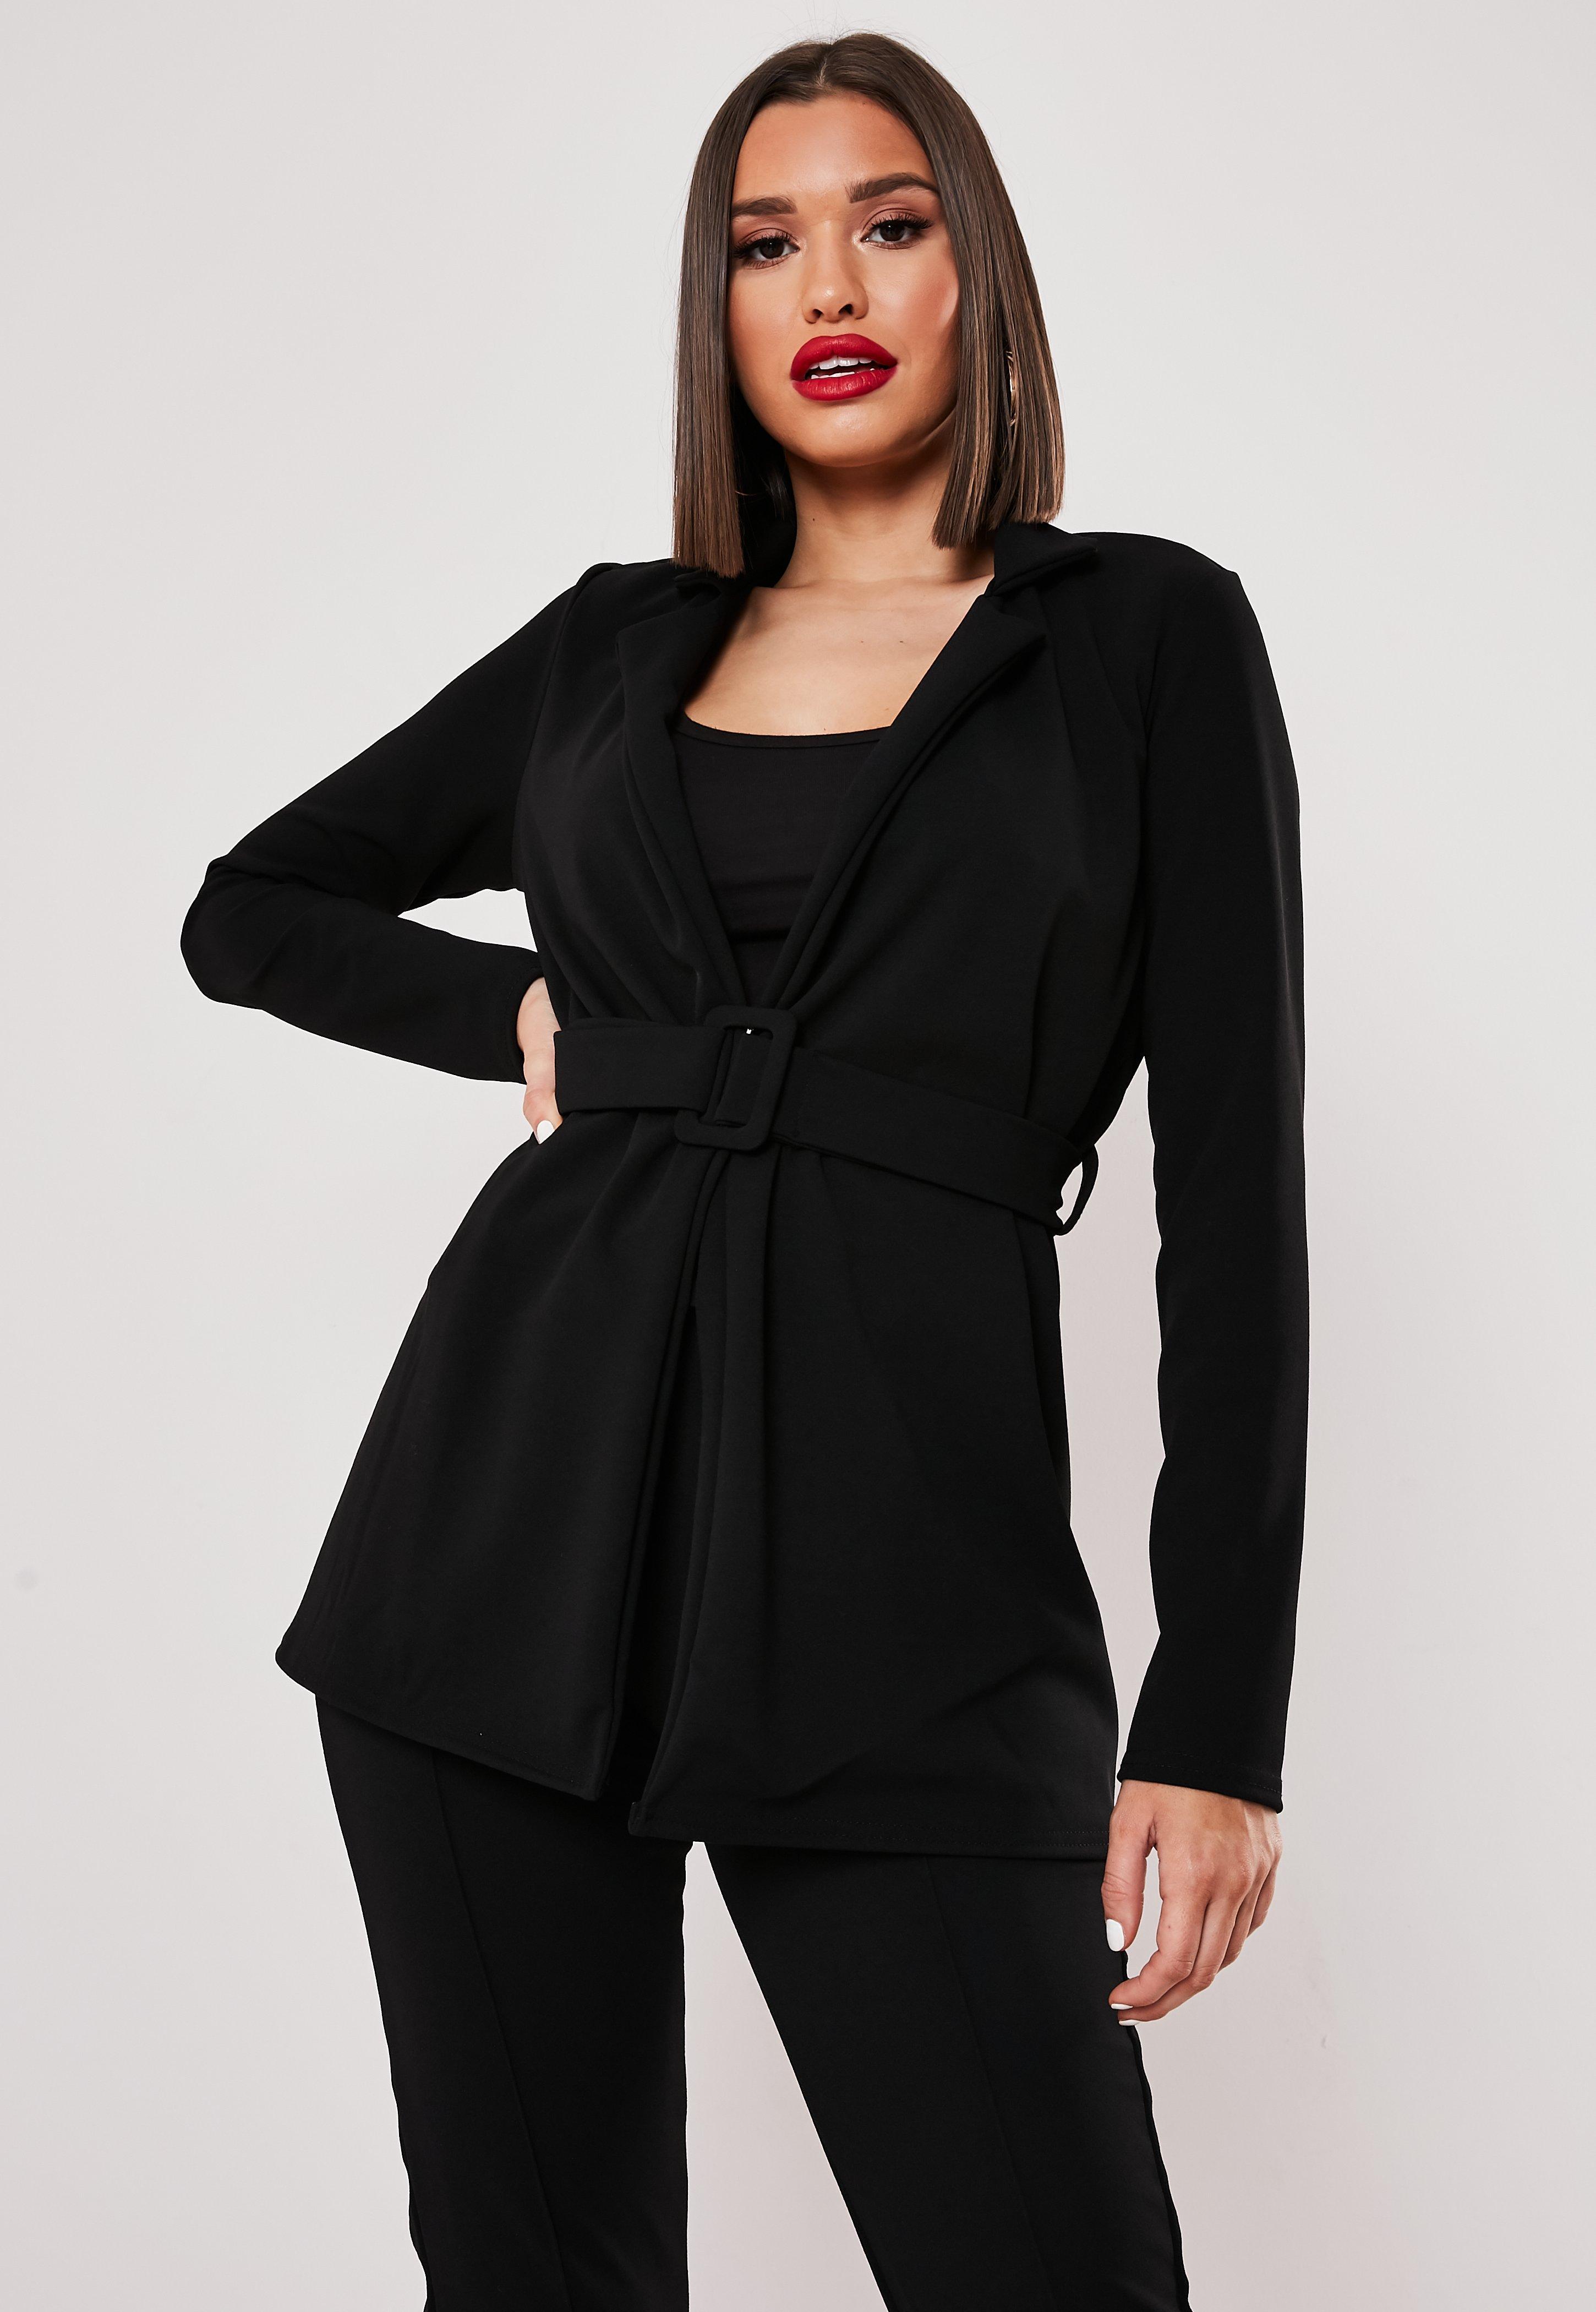 a186358994c6 Women's Blazers Sleeveless & Floral Blazers - Missguided